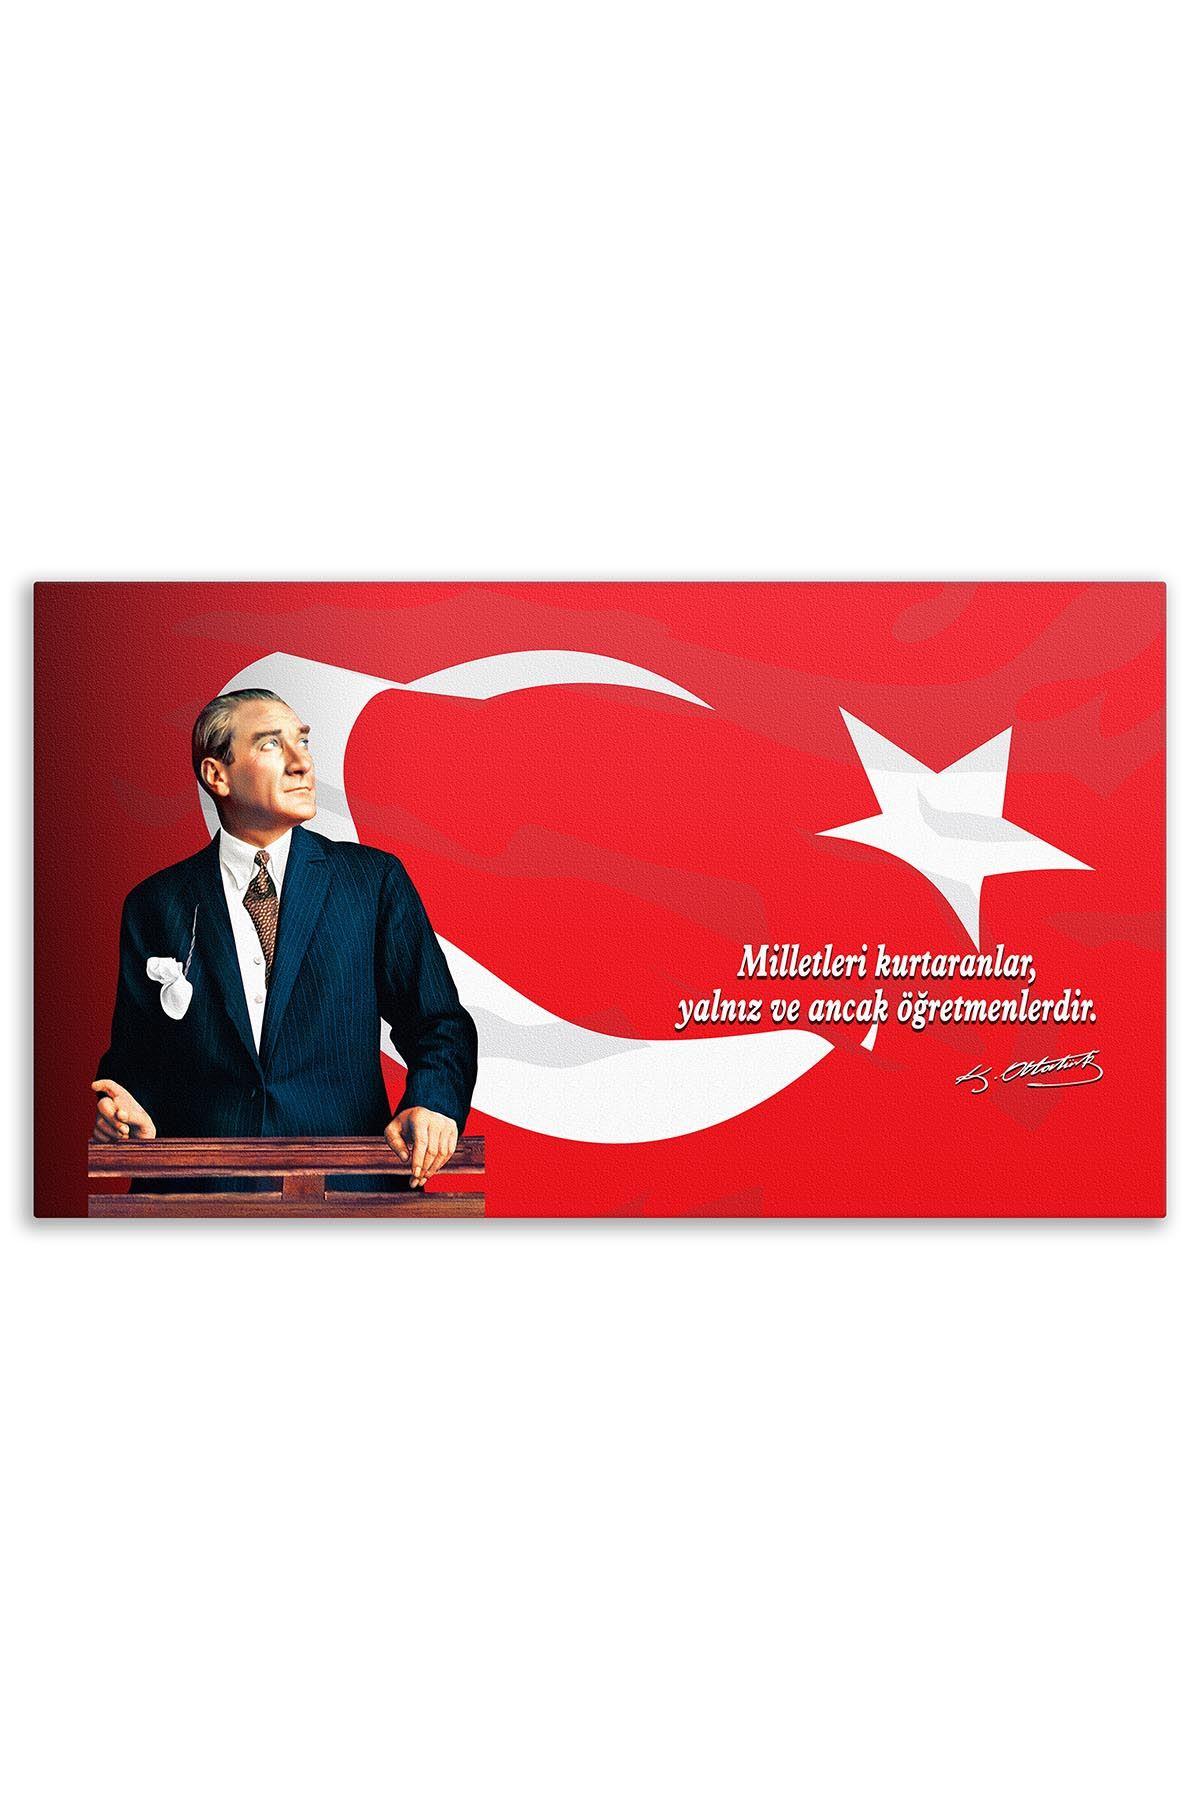 Atatürk Canvas Board With Turkish Flag | Printed Canvas Board | Customized Canvas Board